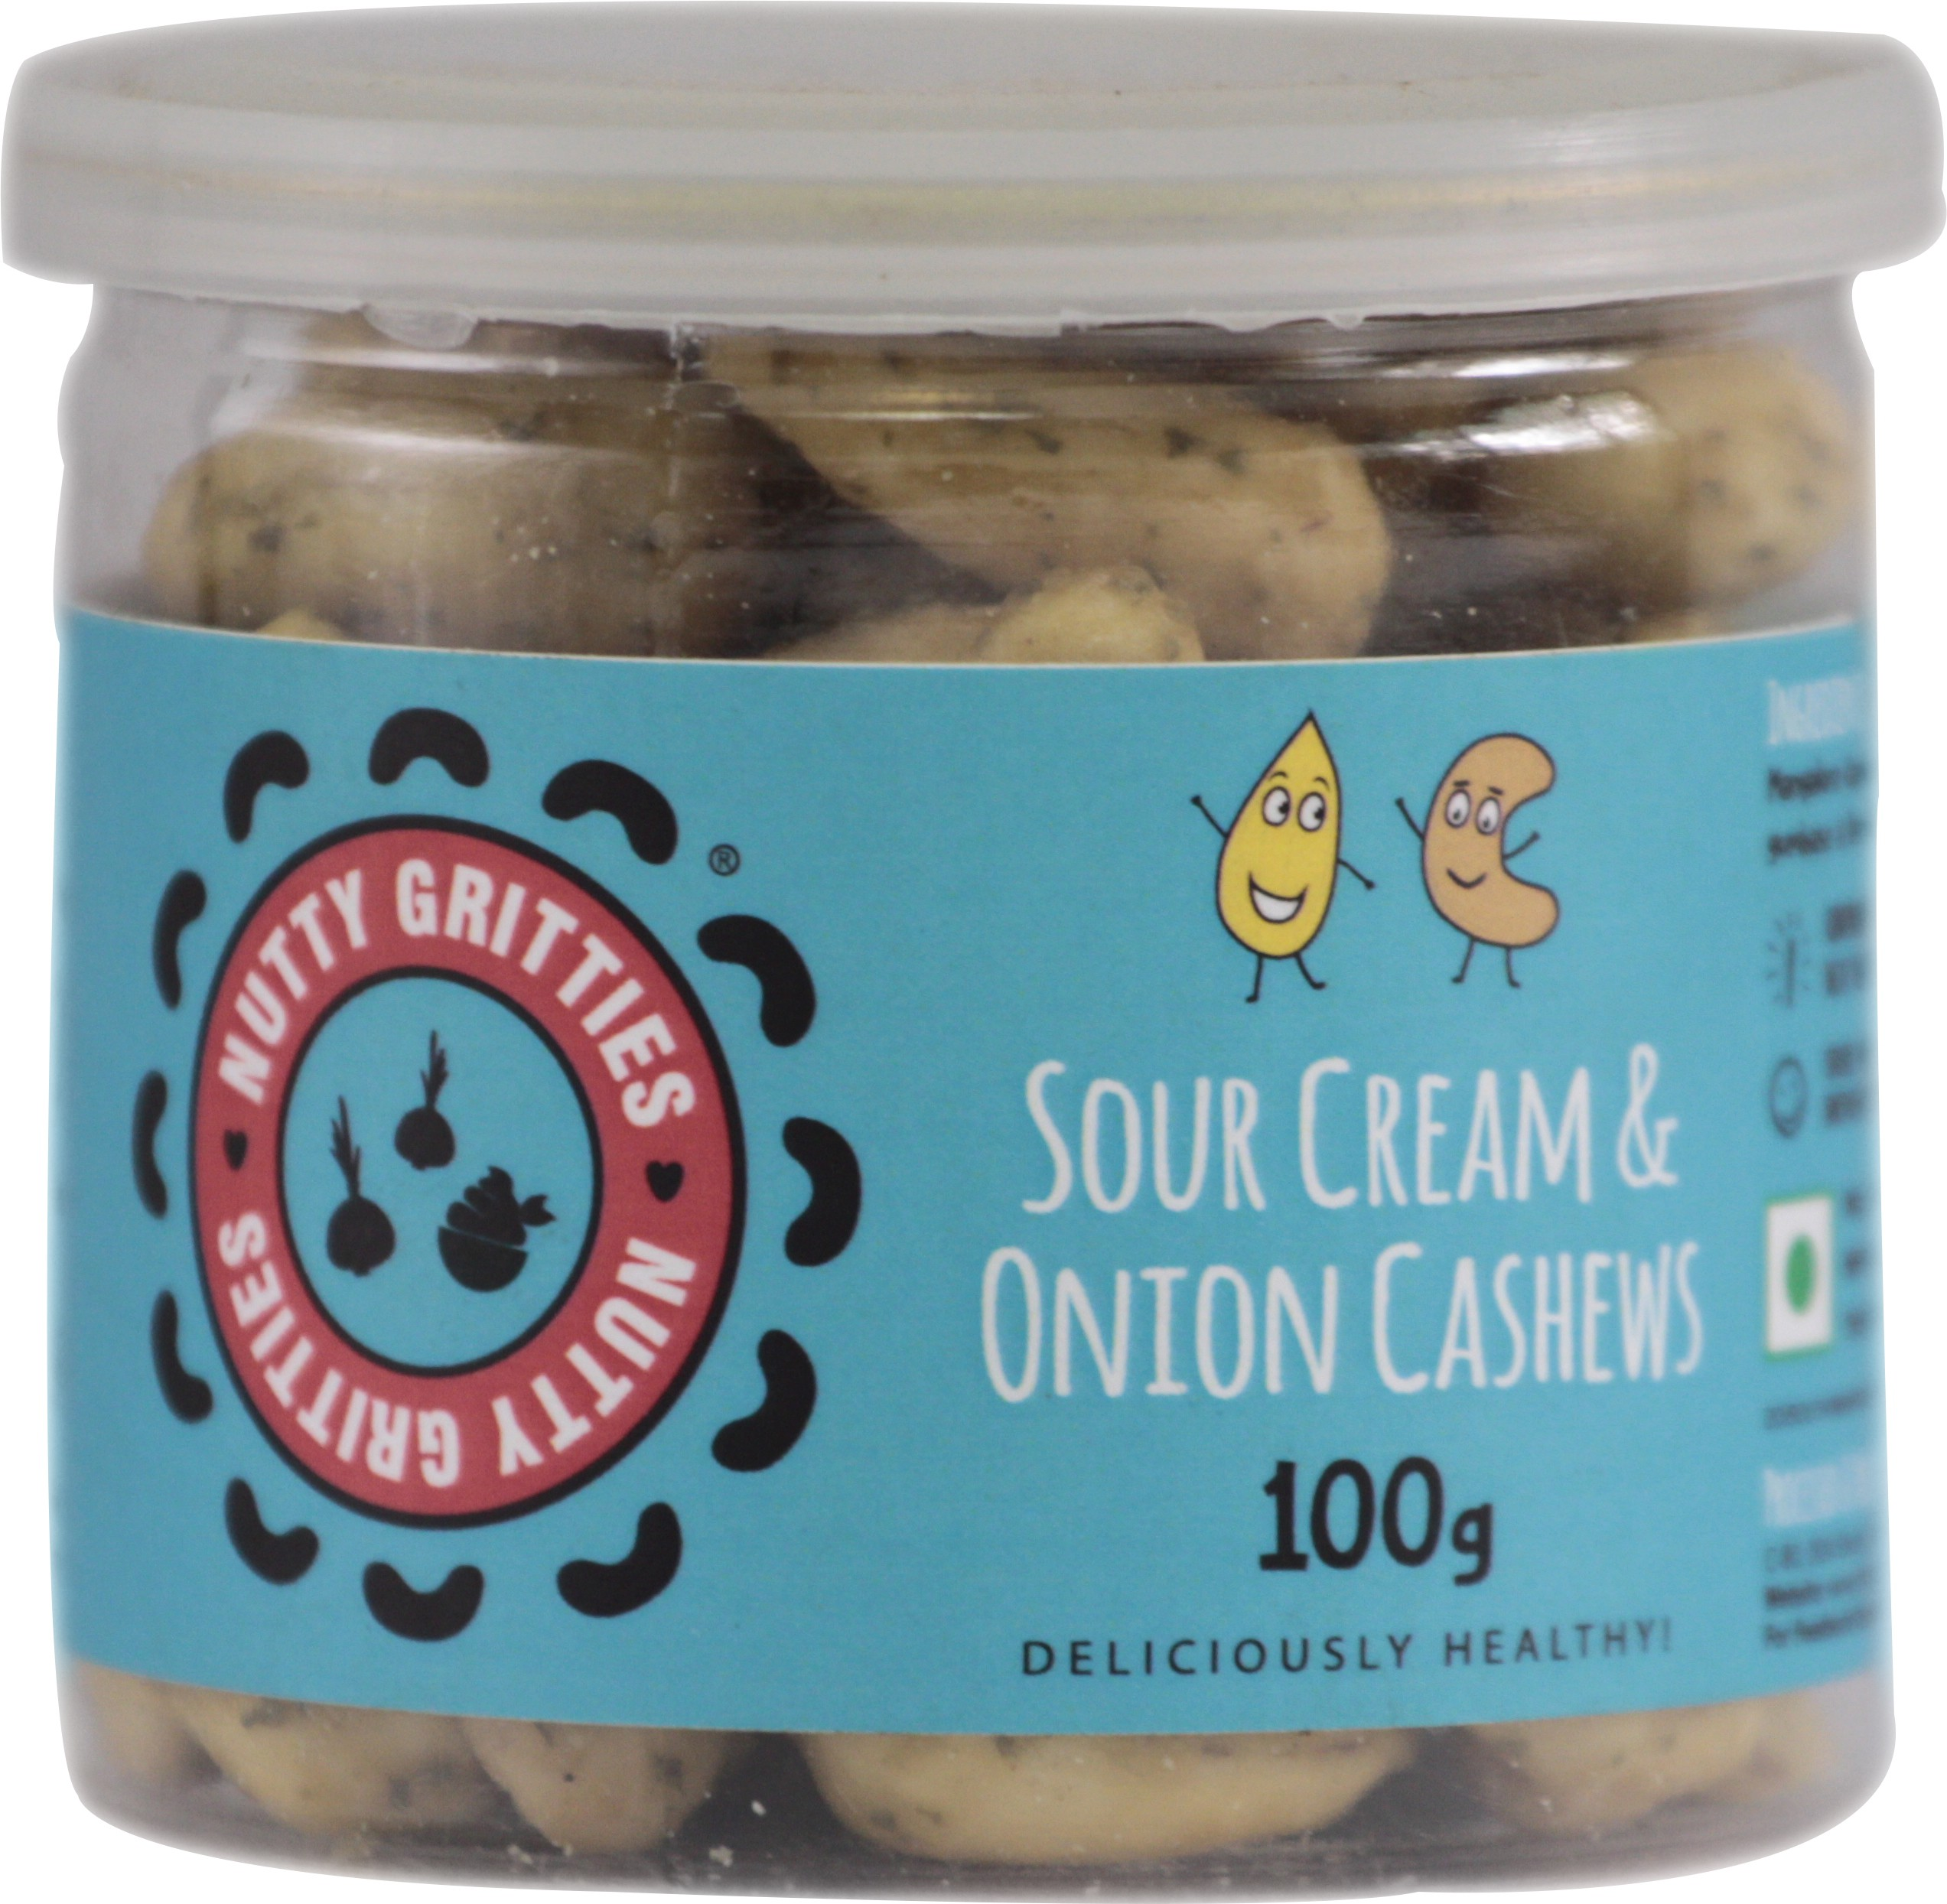 Nutty Gritties Sour Cream & Onion Cashews